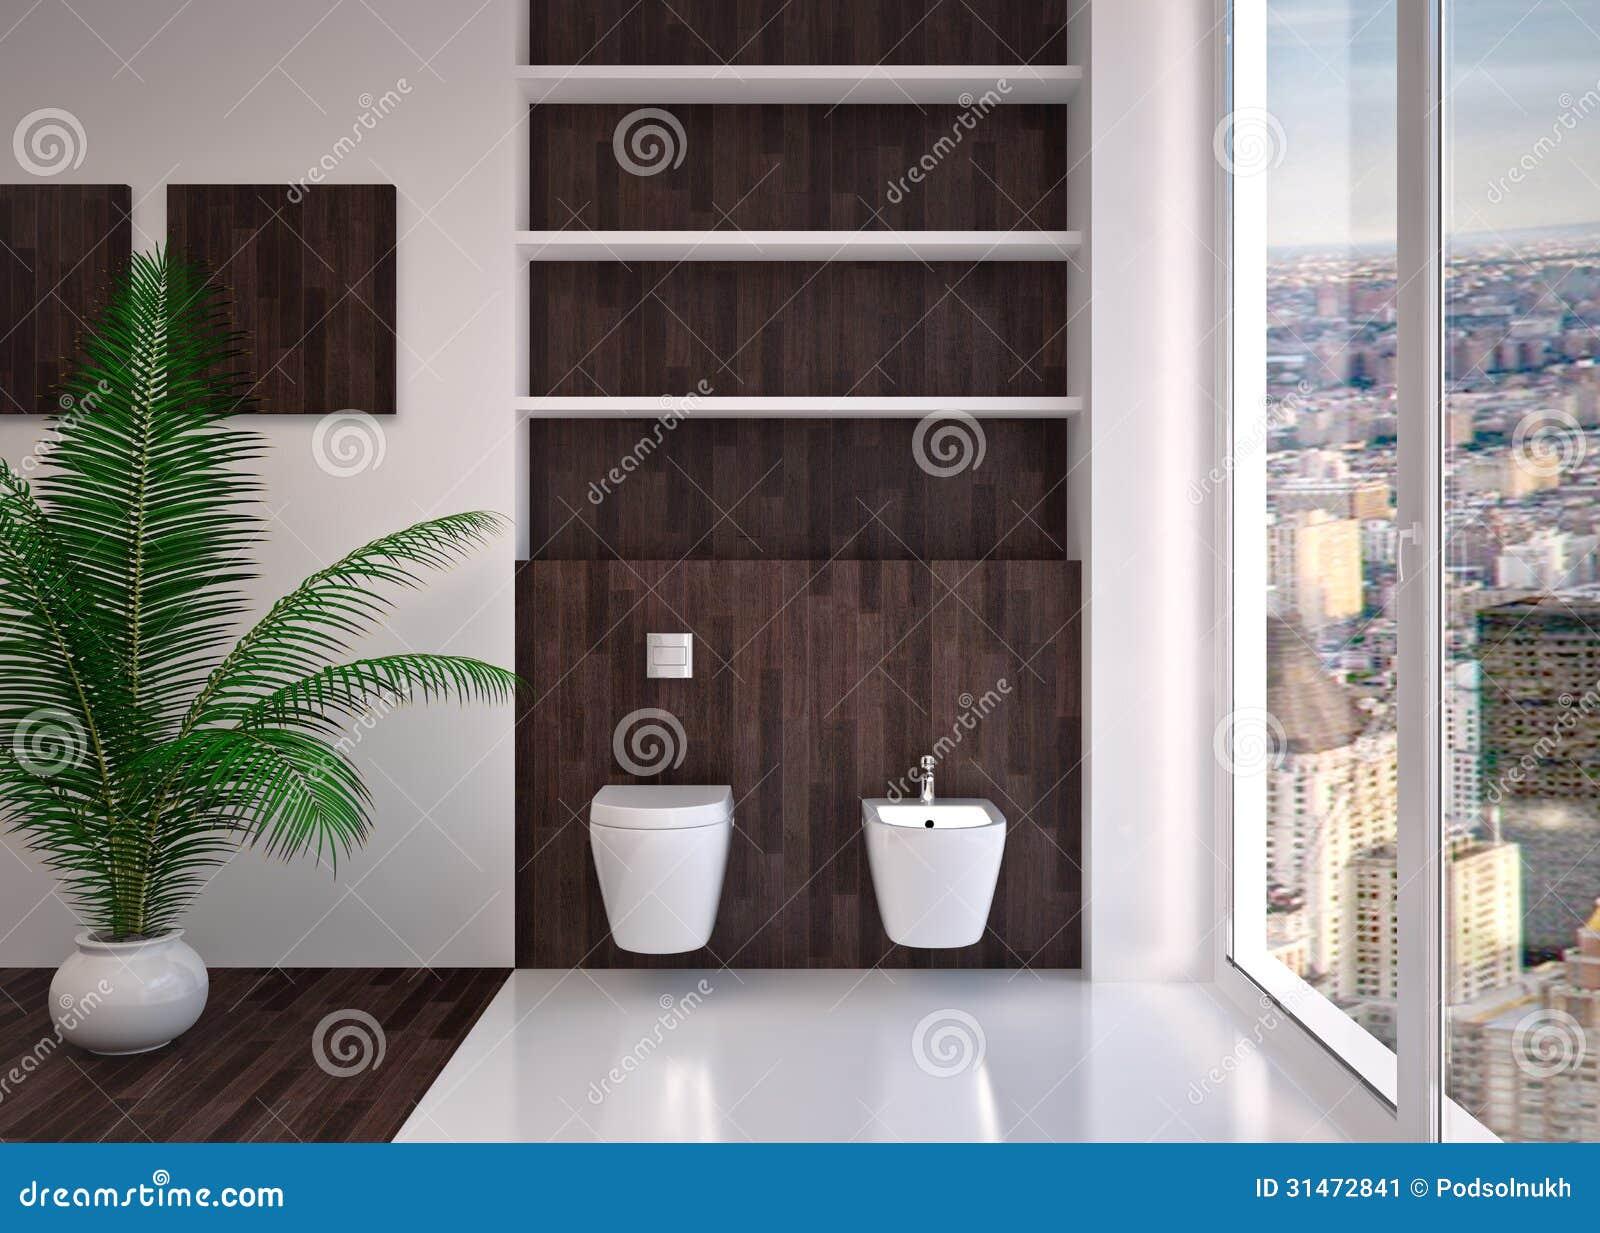 Modern interior of bathroom stock illustration for Modern house interior bathroom